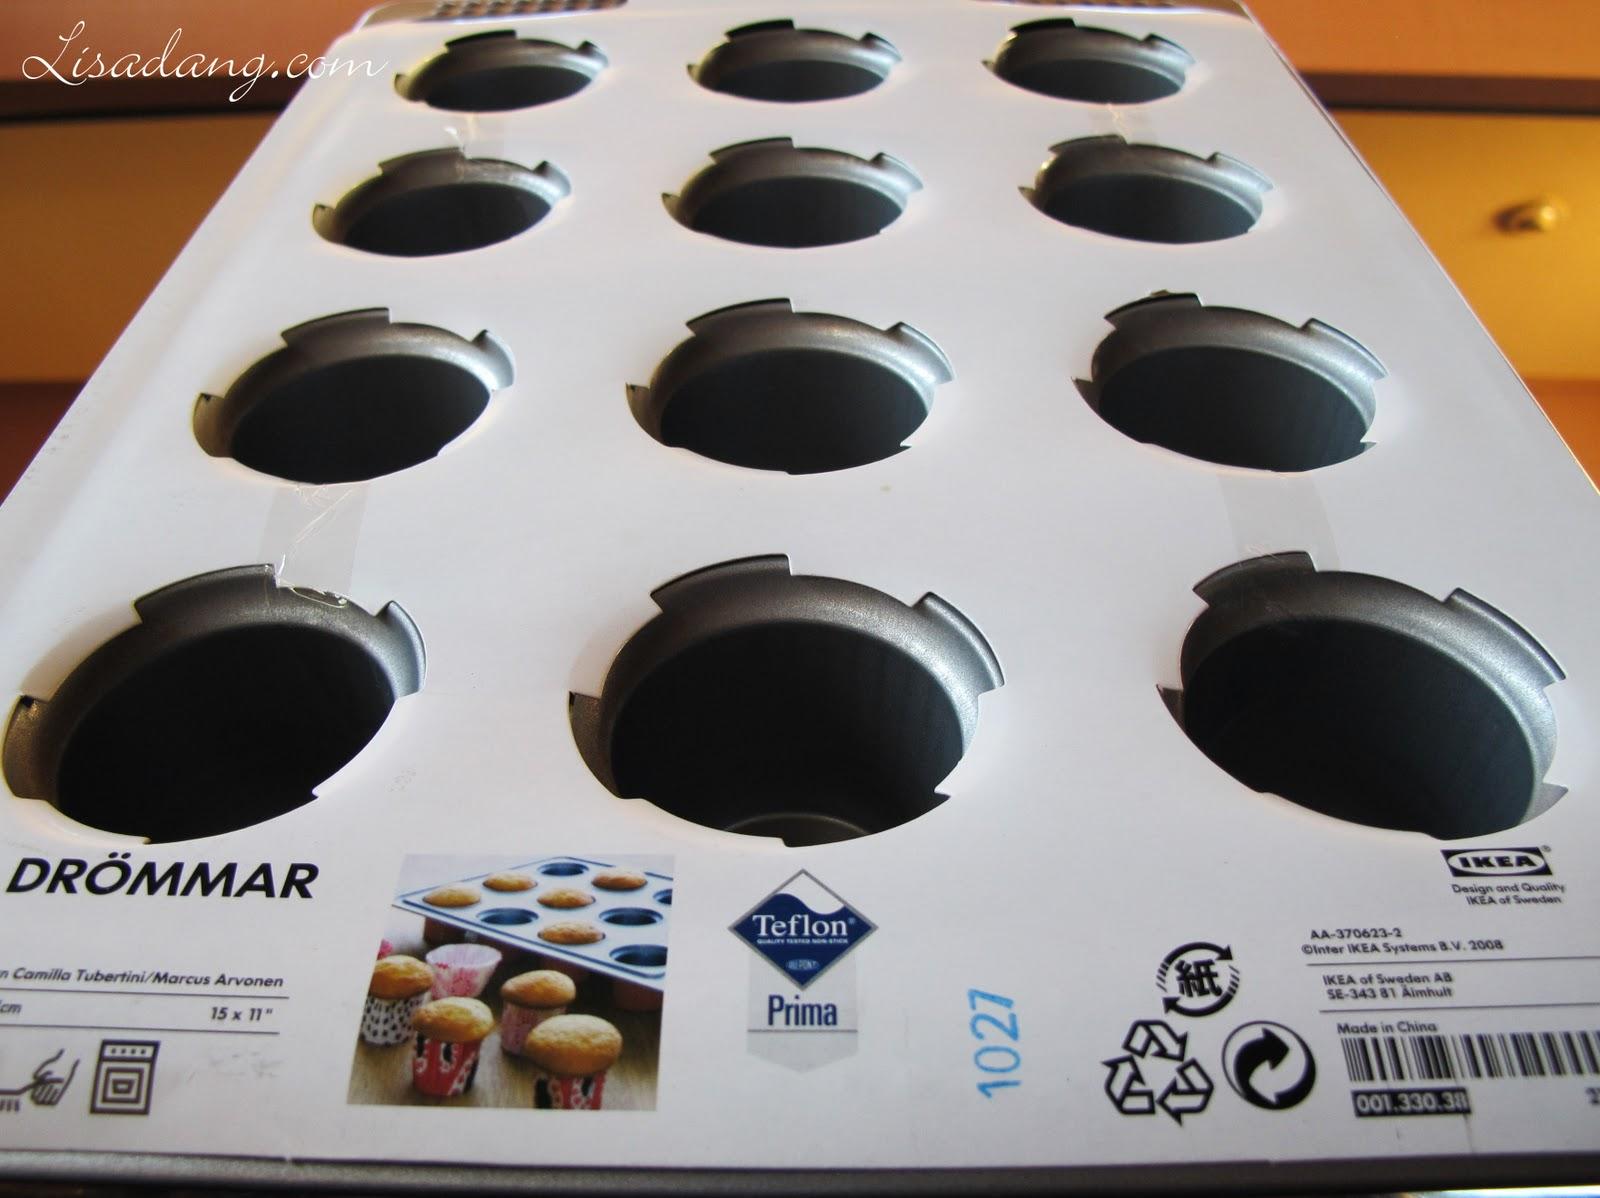 Ikea Muffins dang it delicious ikea muffin tin